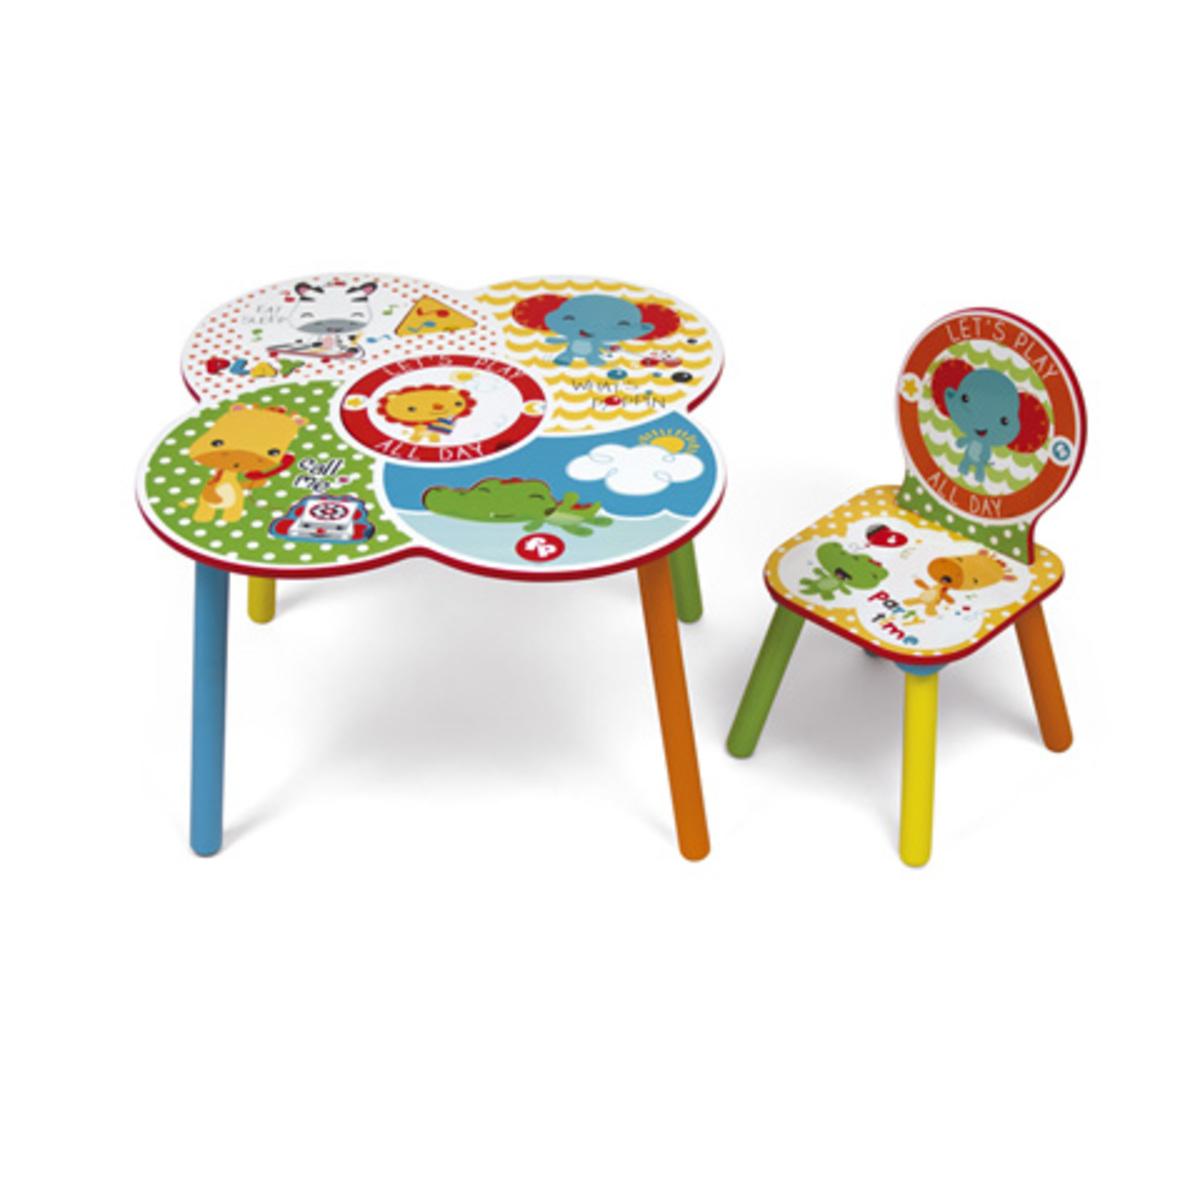 Childrens asztal  széklet Fisher Price